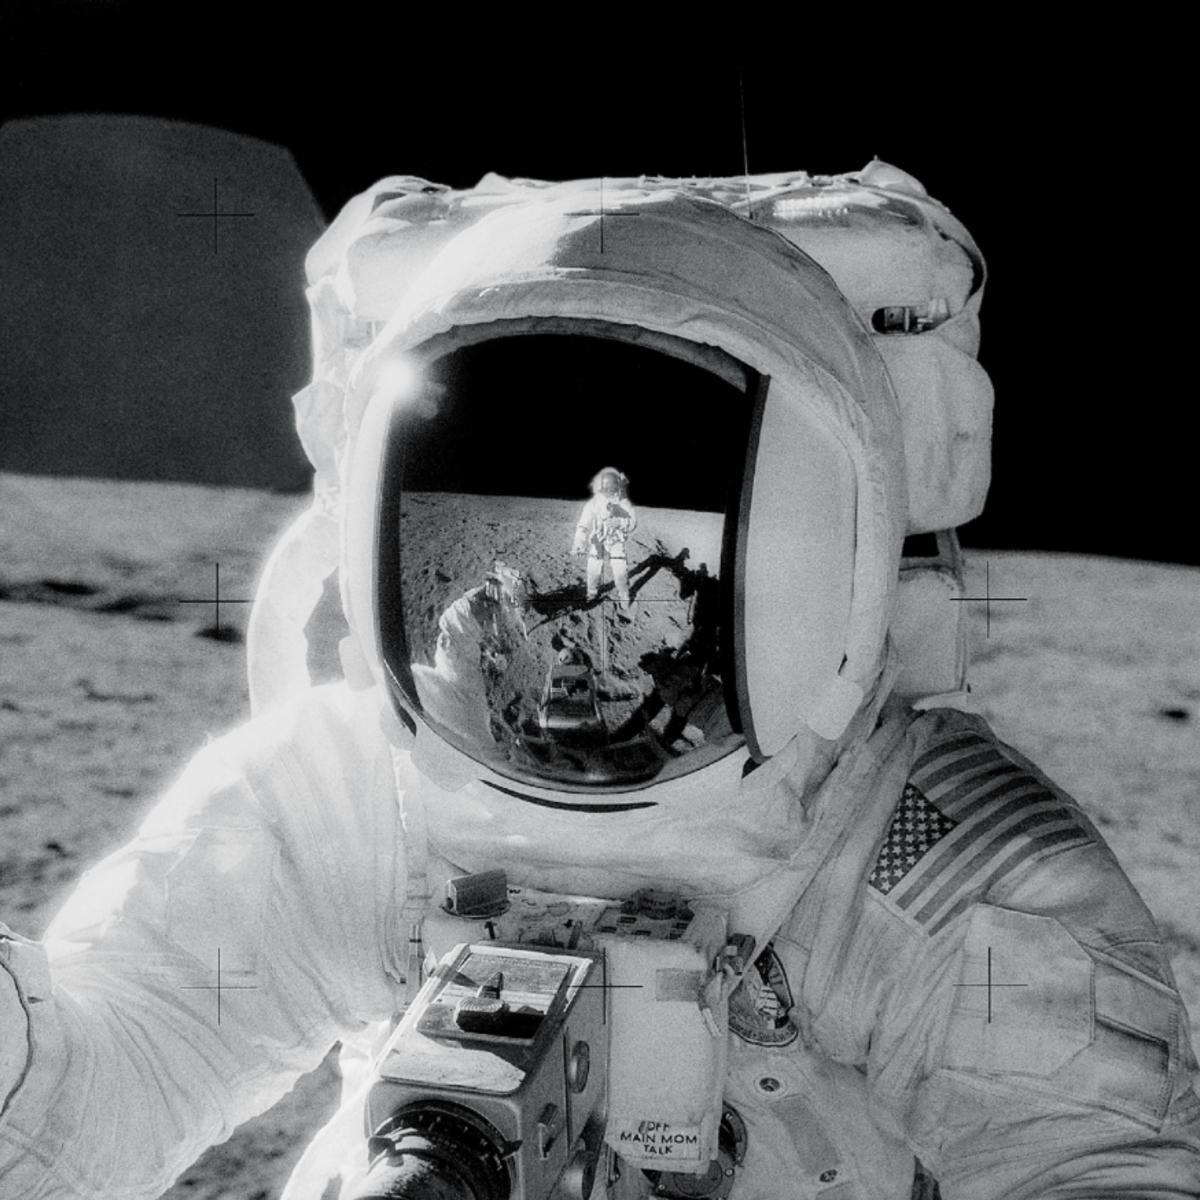 NASA image of astronaut on the moon